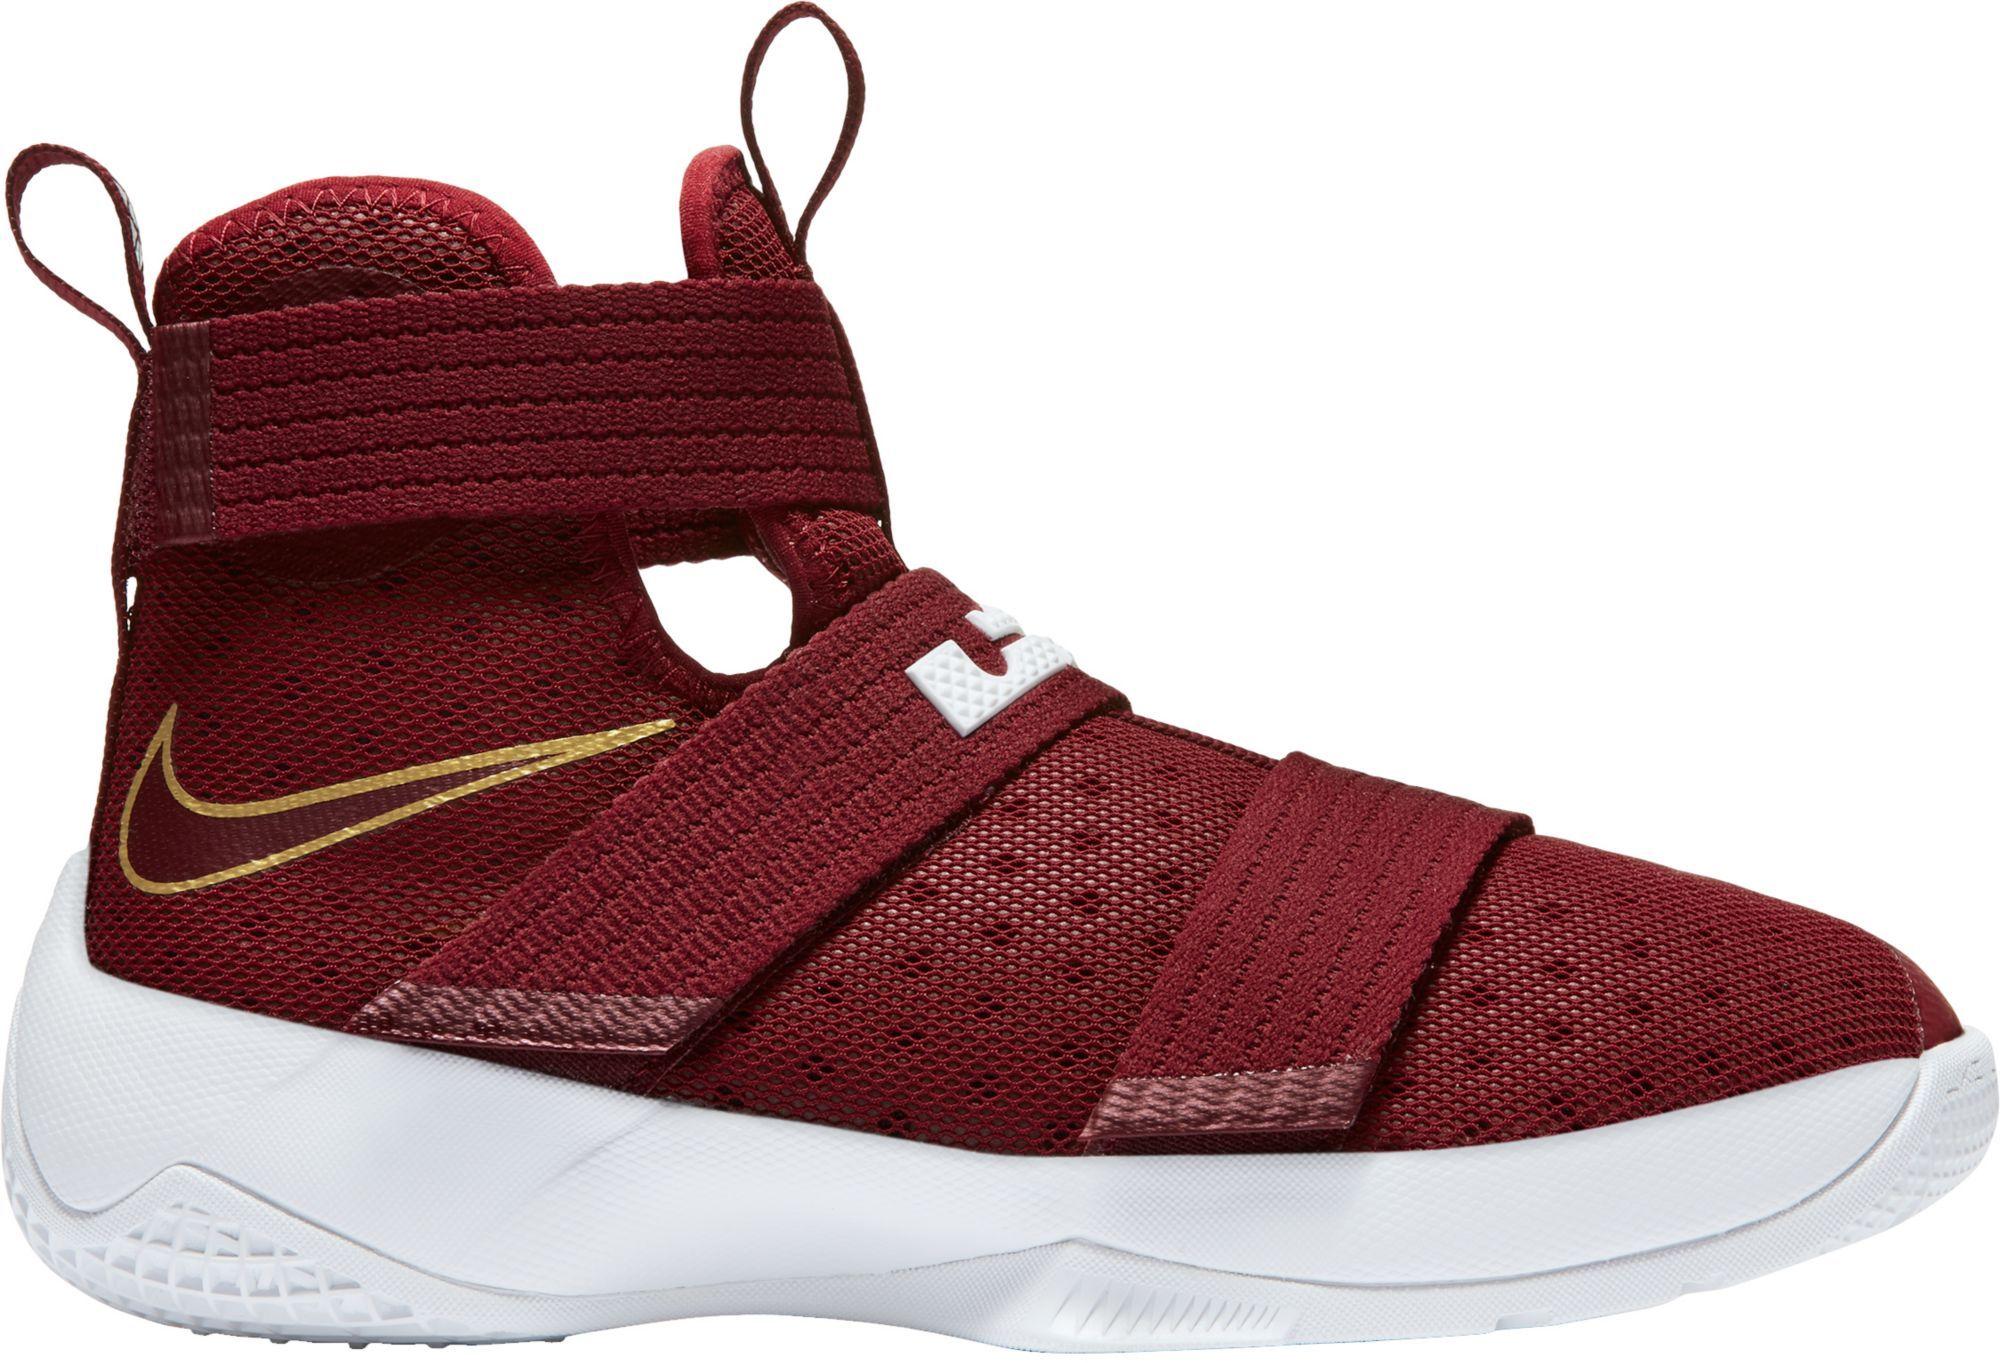 b20c5539181 Nike Kids  Grade School Zoom LeBron Soldier X Basketball Shoes